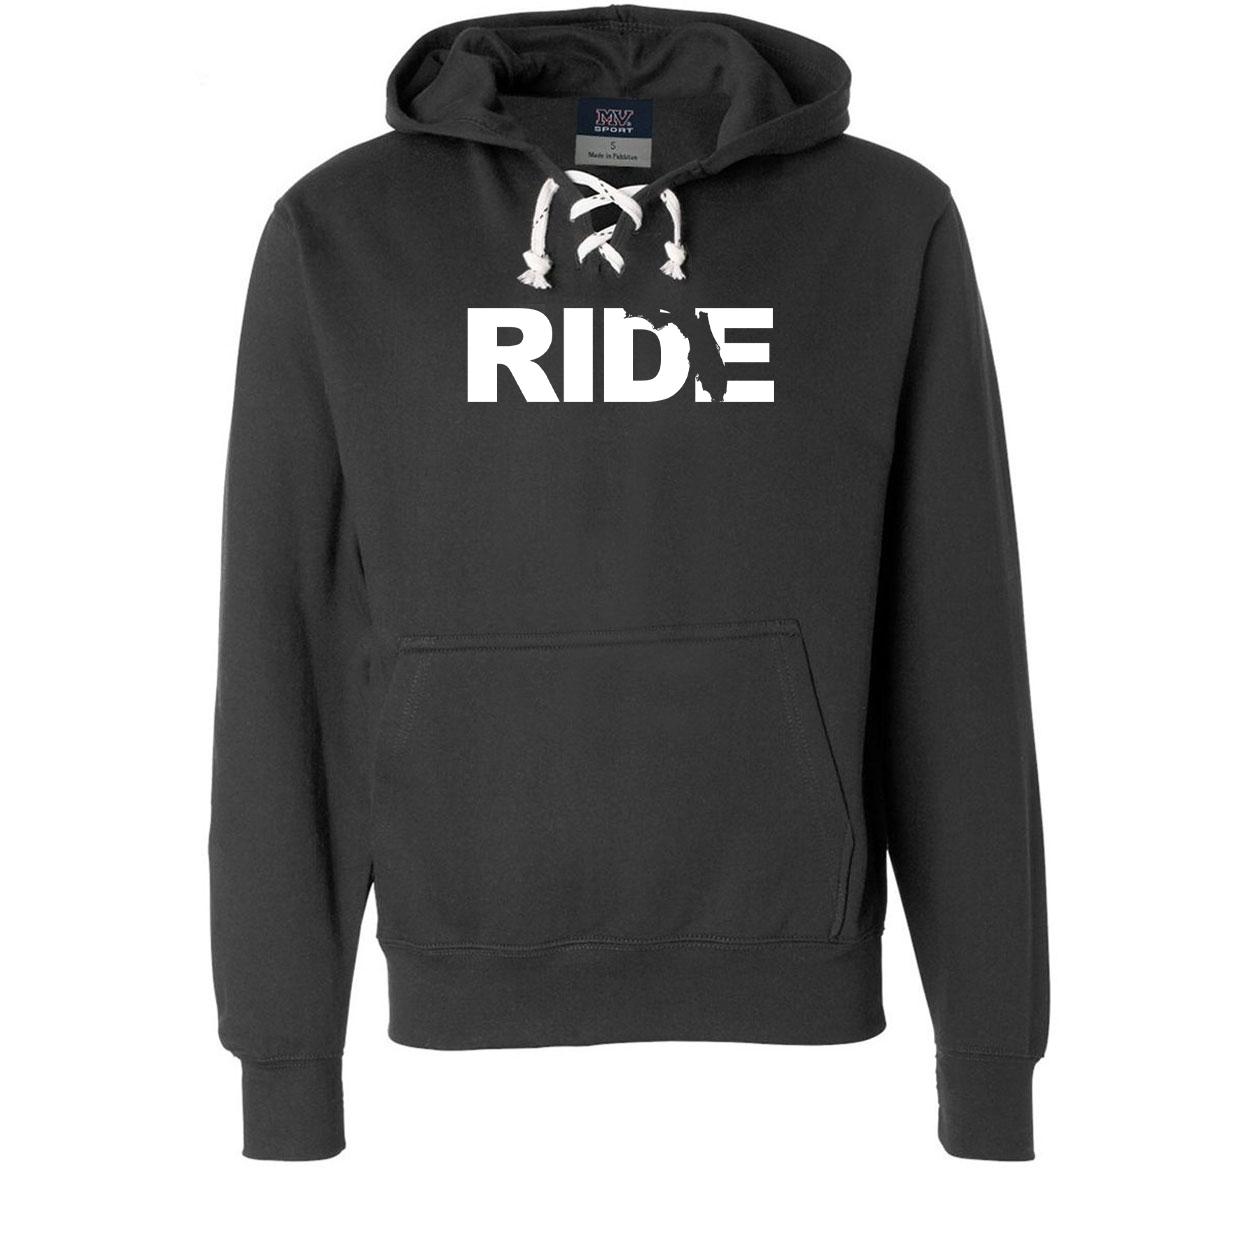 Ride Florida Classic Unisex Premium Hockey Sweatshirt Black (White Logo)